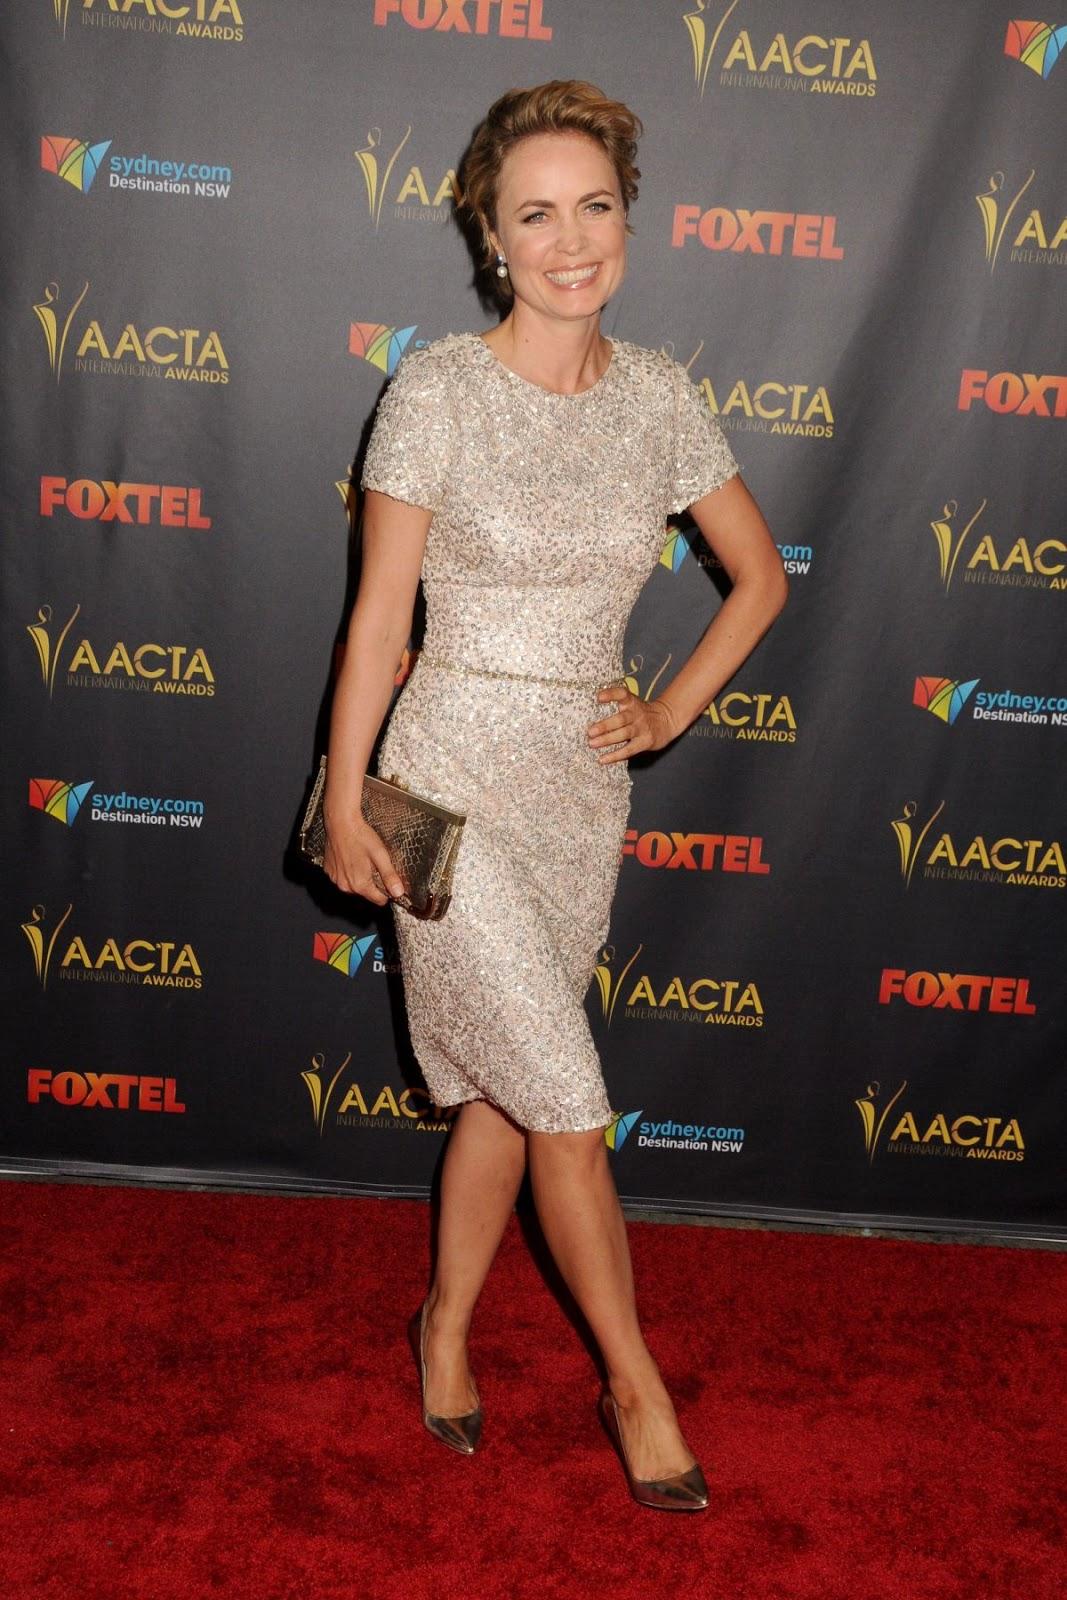 London Has Fallen actress Radha Mitchell at 5th AACTA International Awards